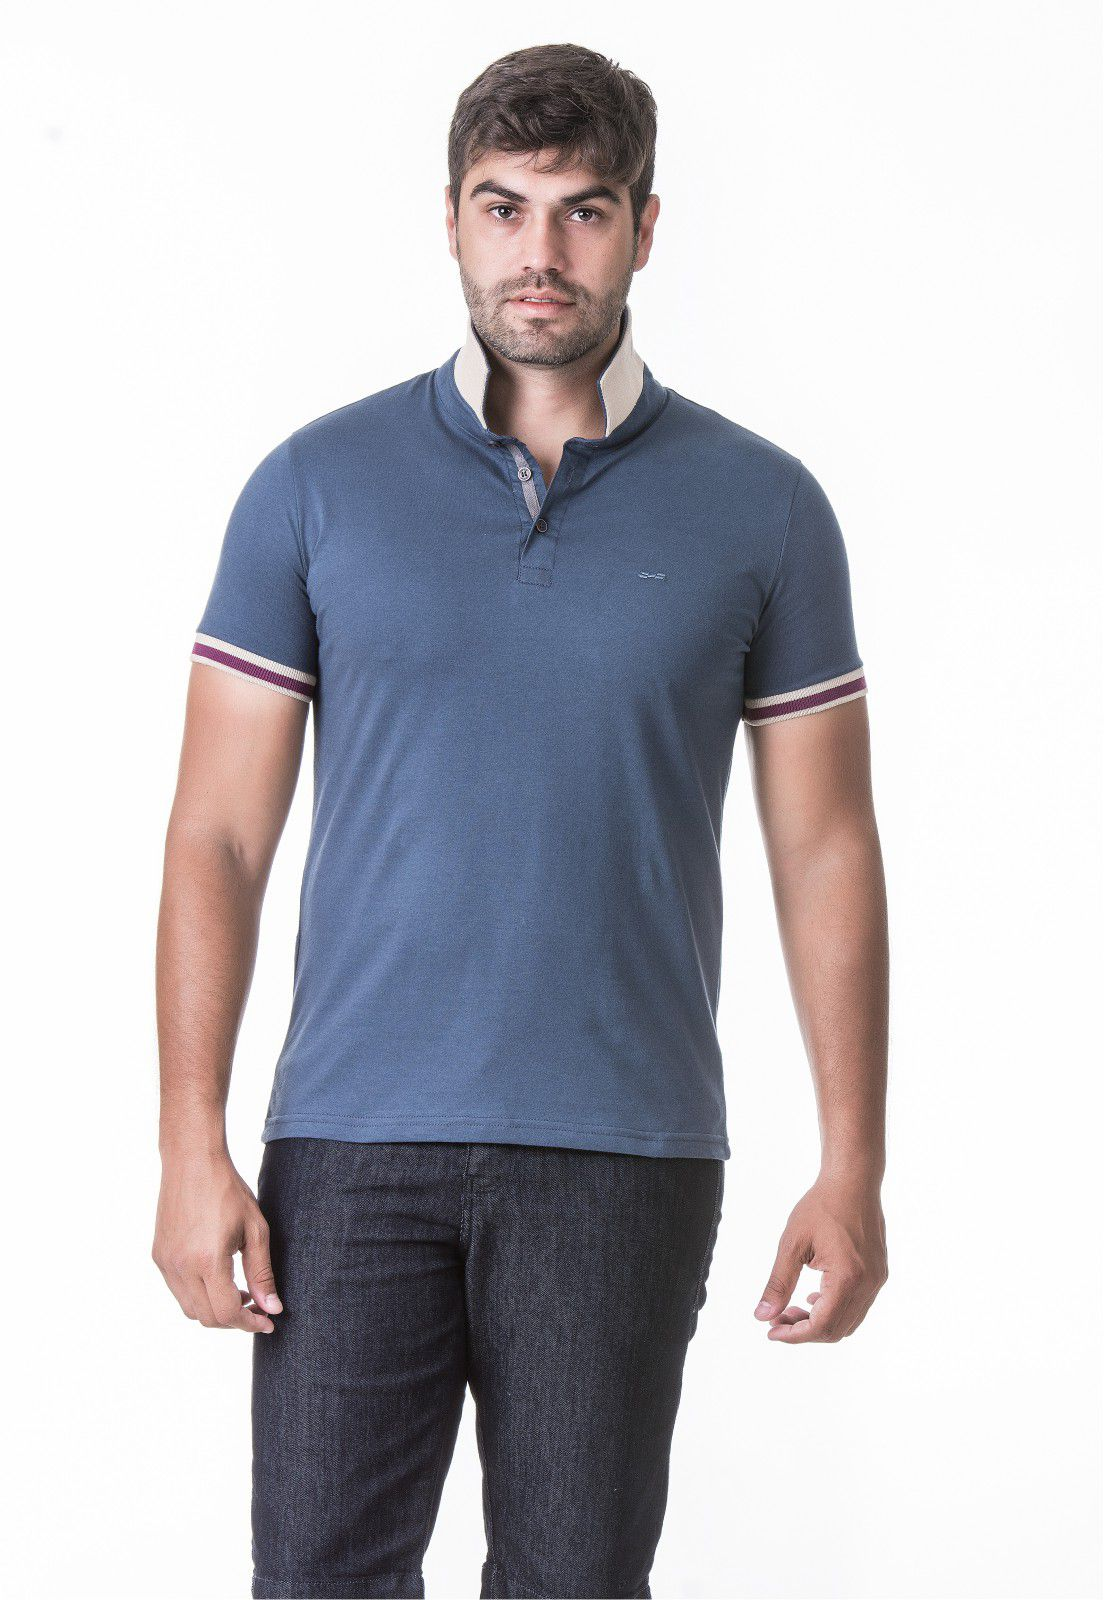 Camisa Polo Masculina Hifen com Gola Dupla